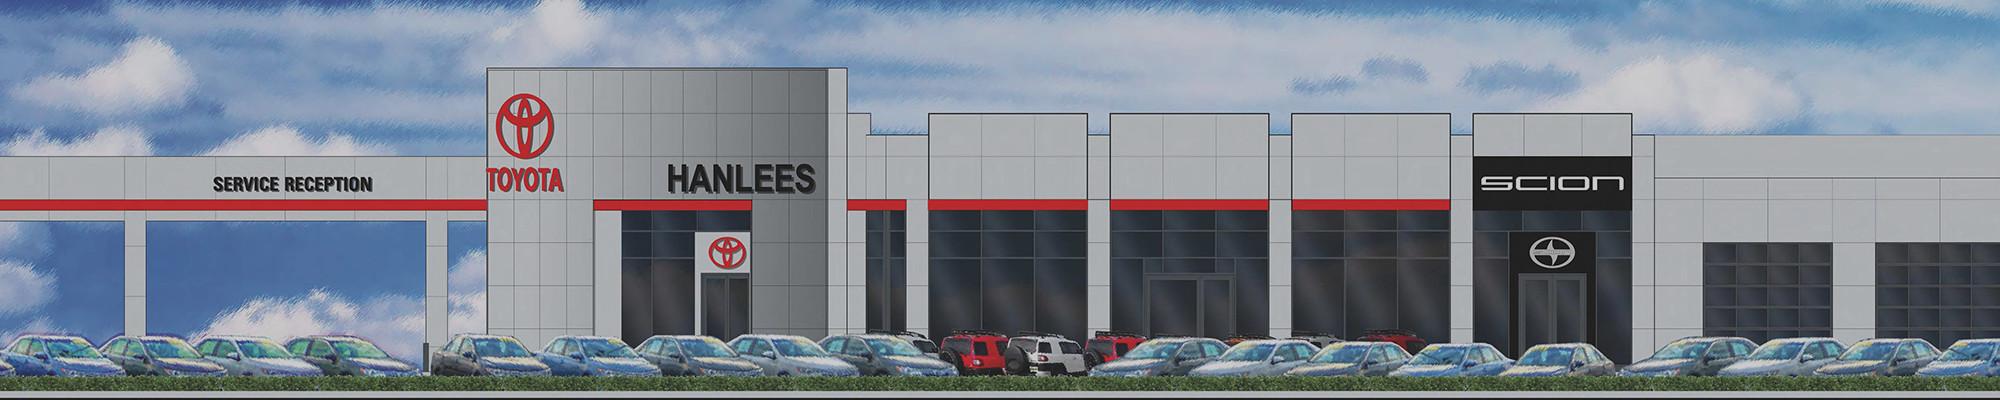 R L Davidson Architects Hanlees Hilltop Toyota